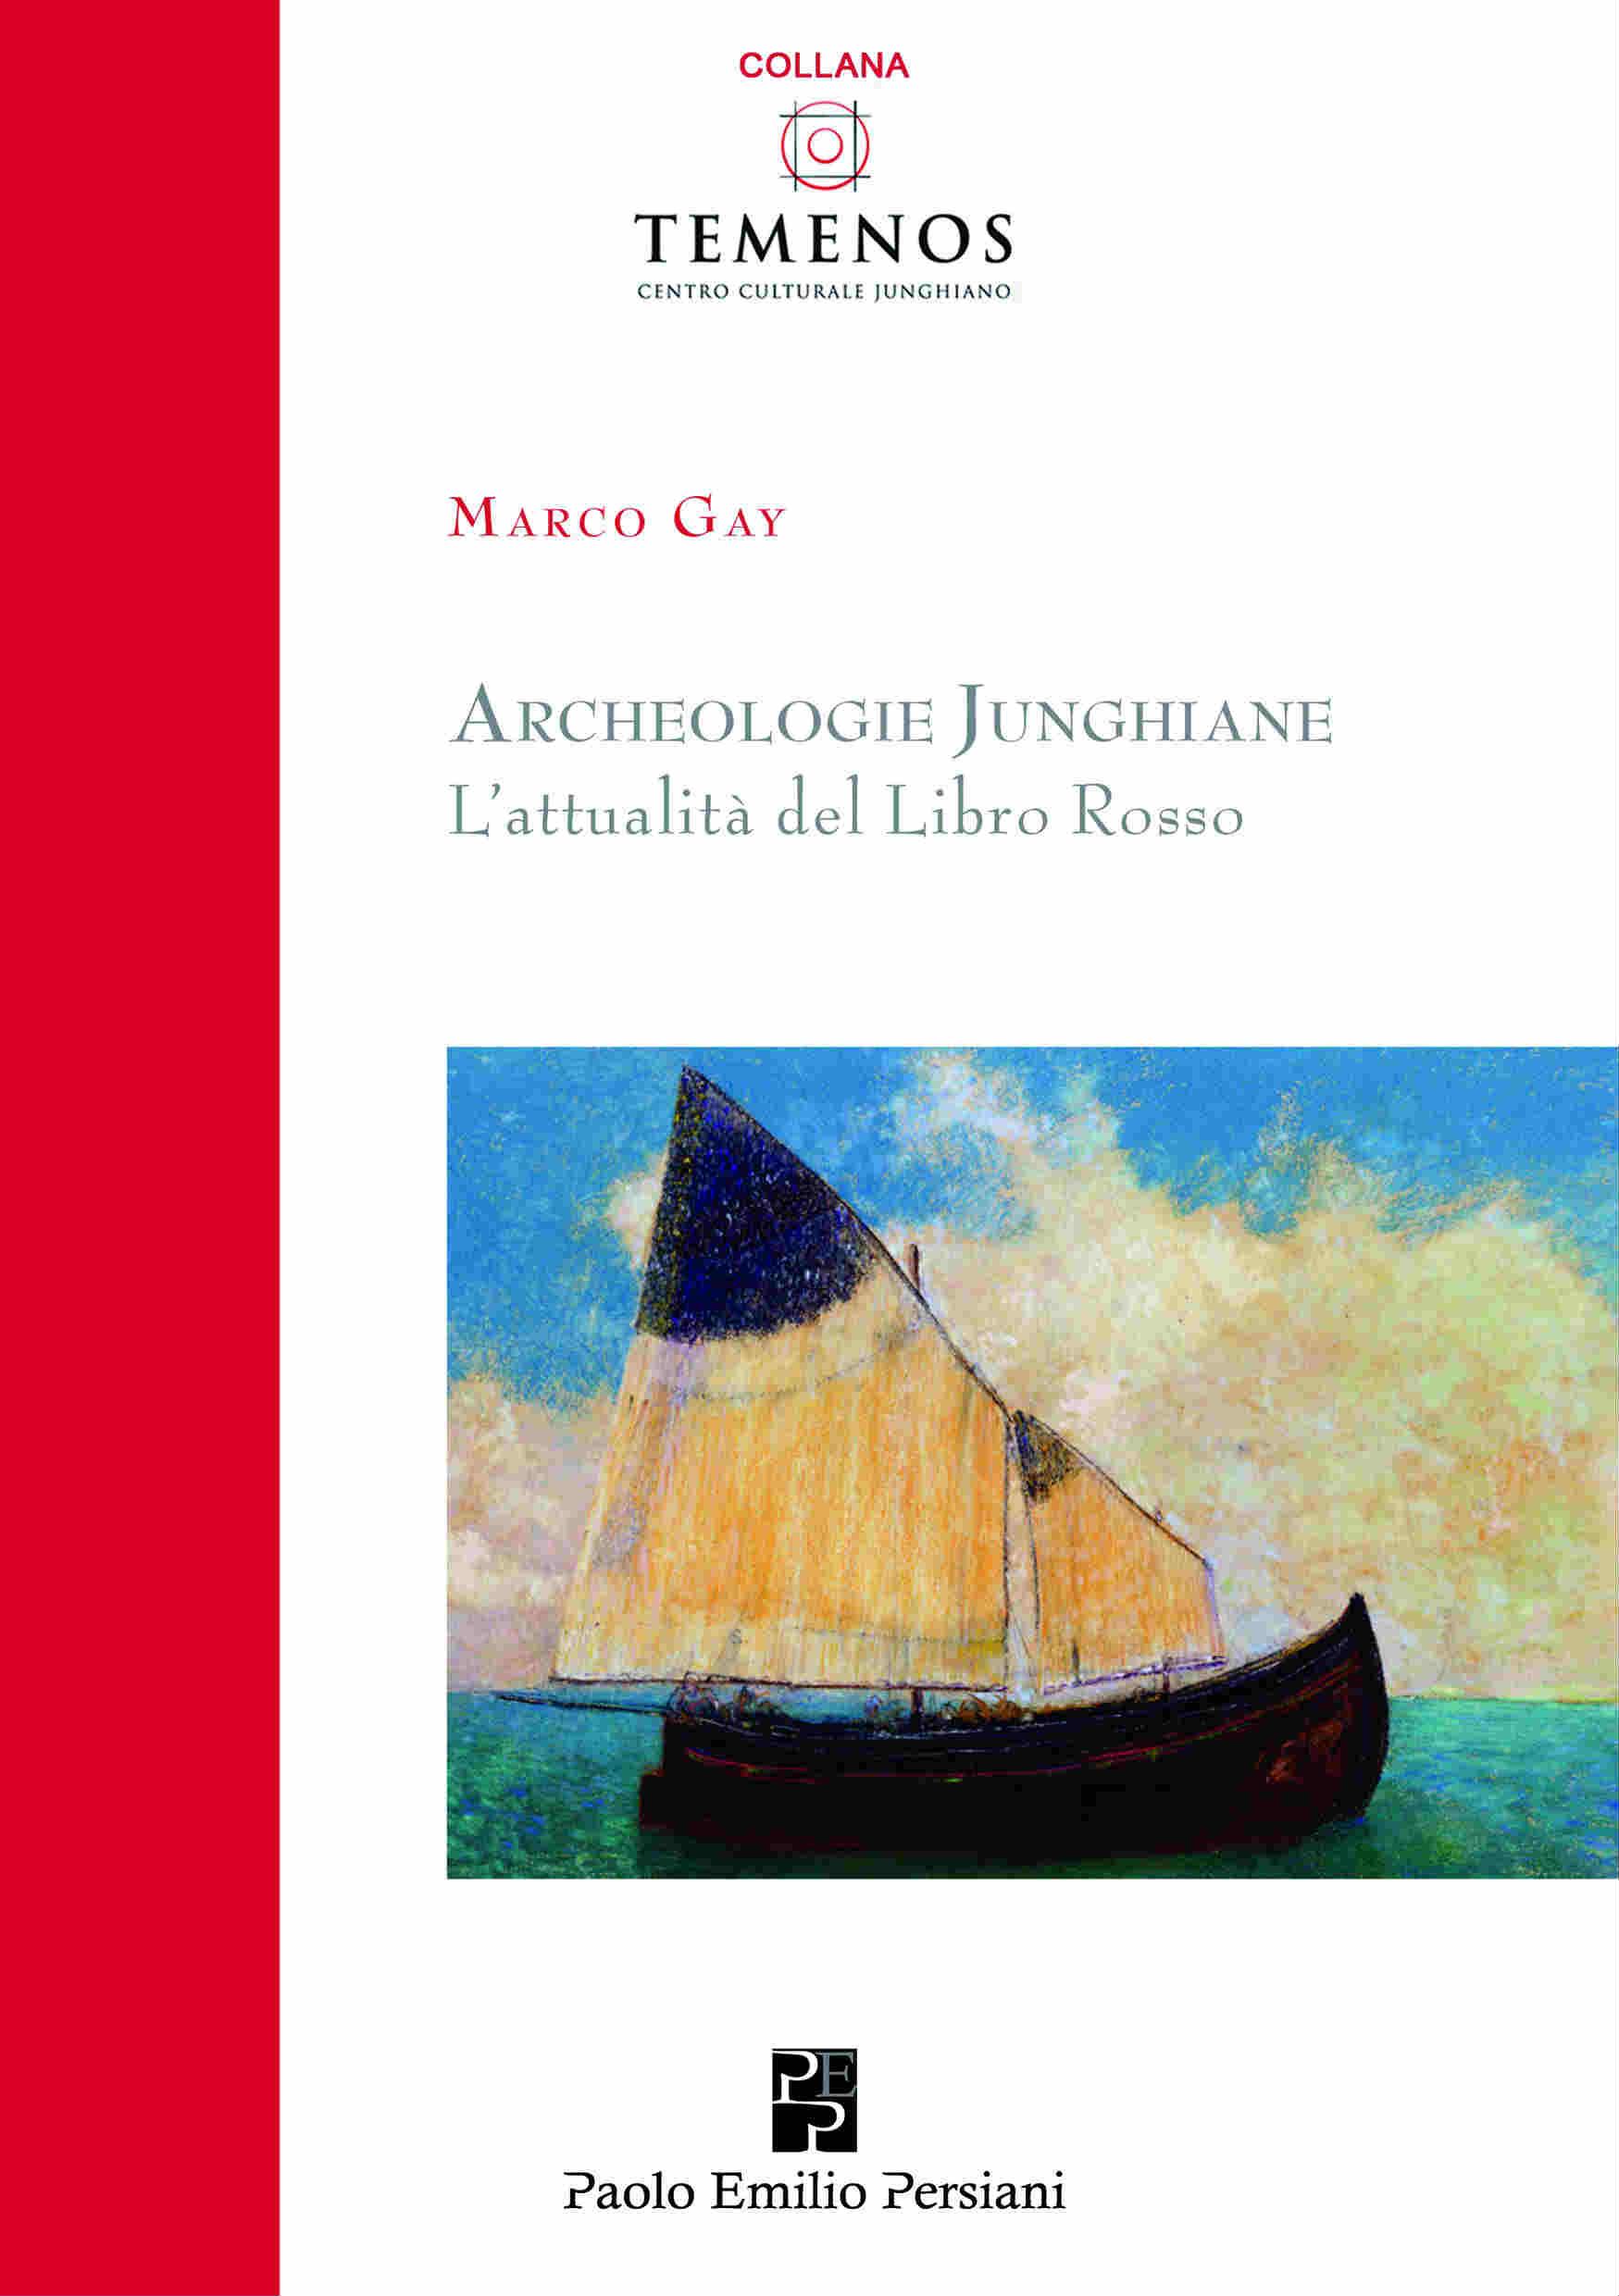 Libro Rosso Marco Gay Archeologie Junghiane